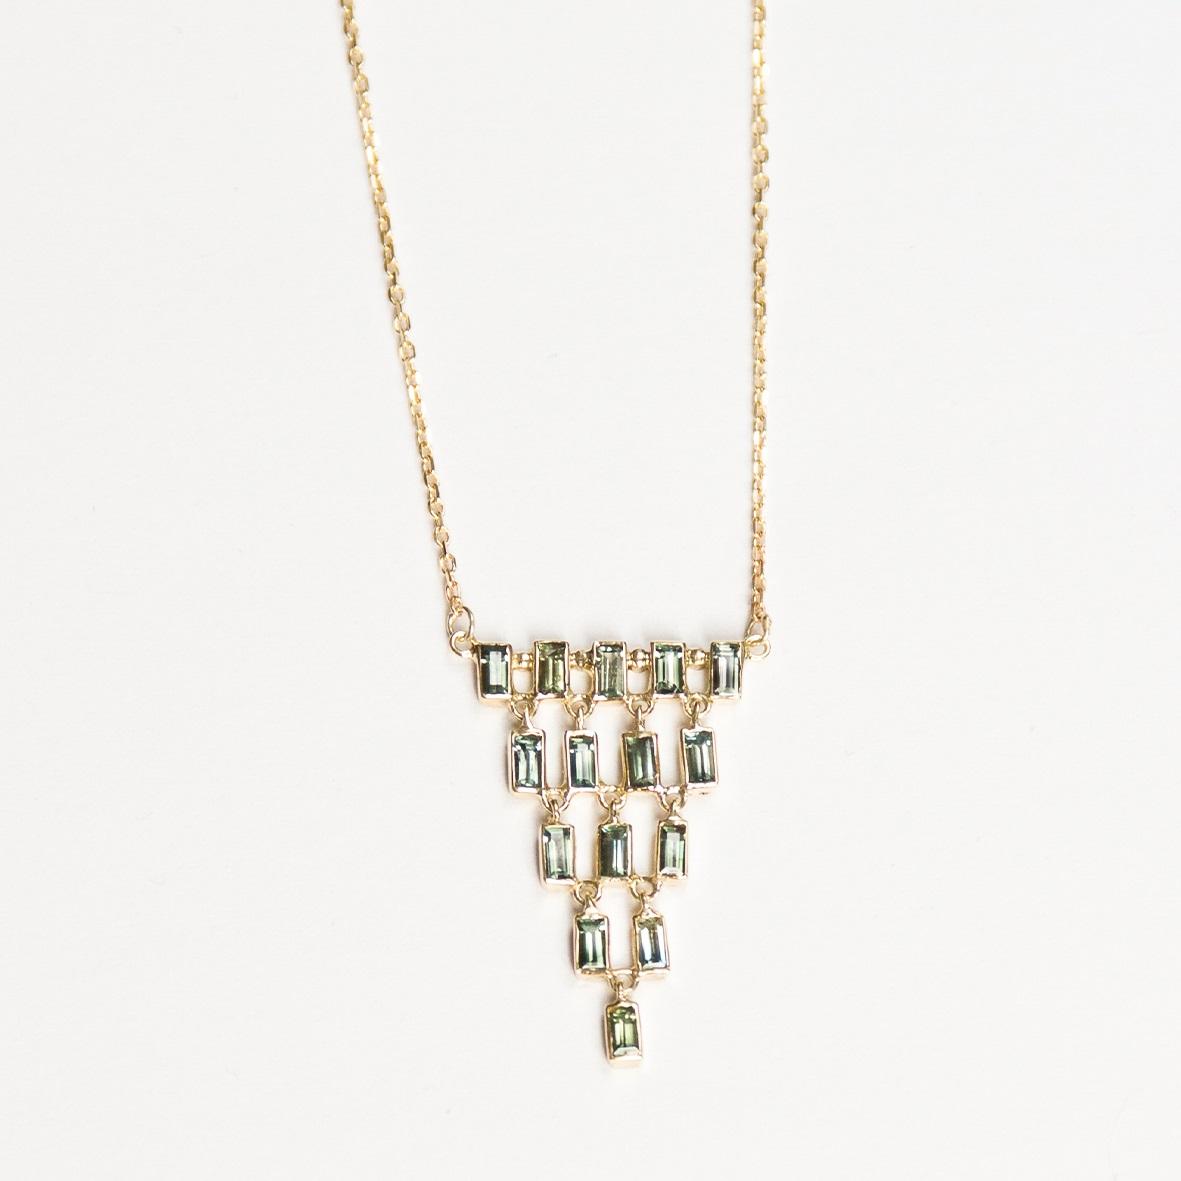 ficha1_green_baguette_cascade_necklace